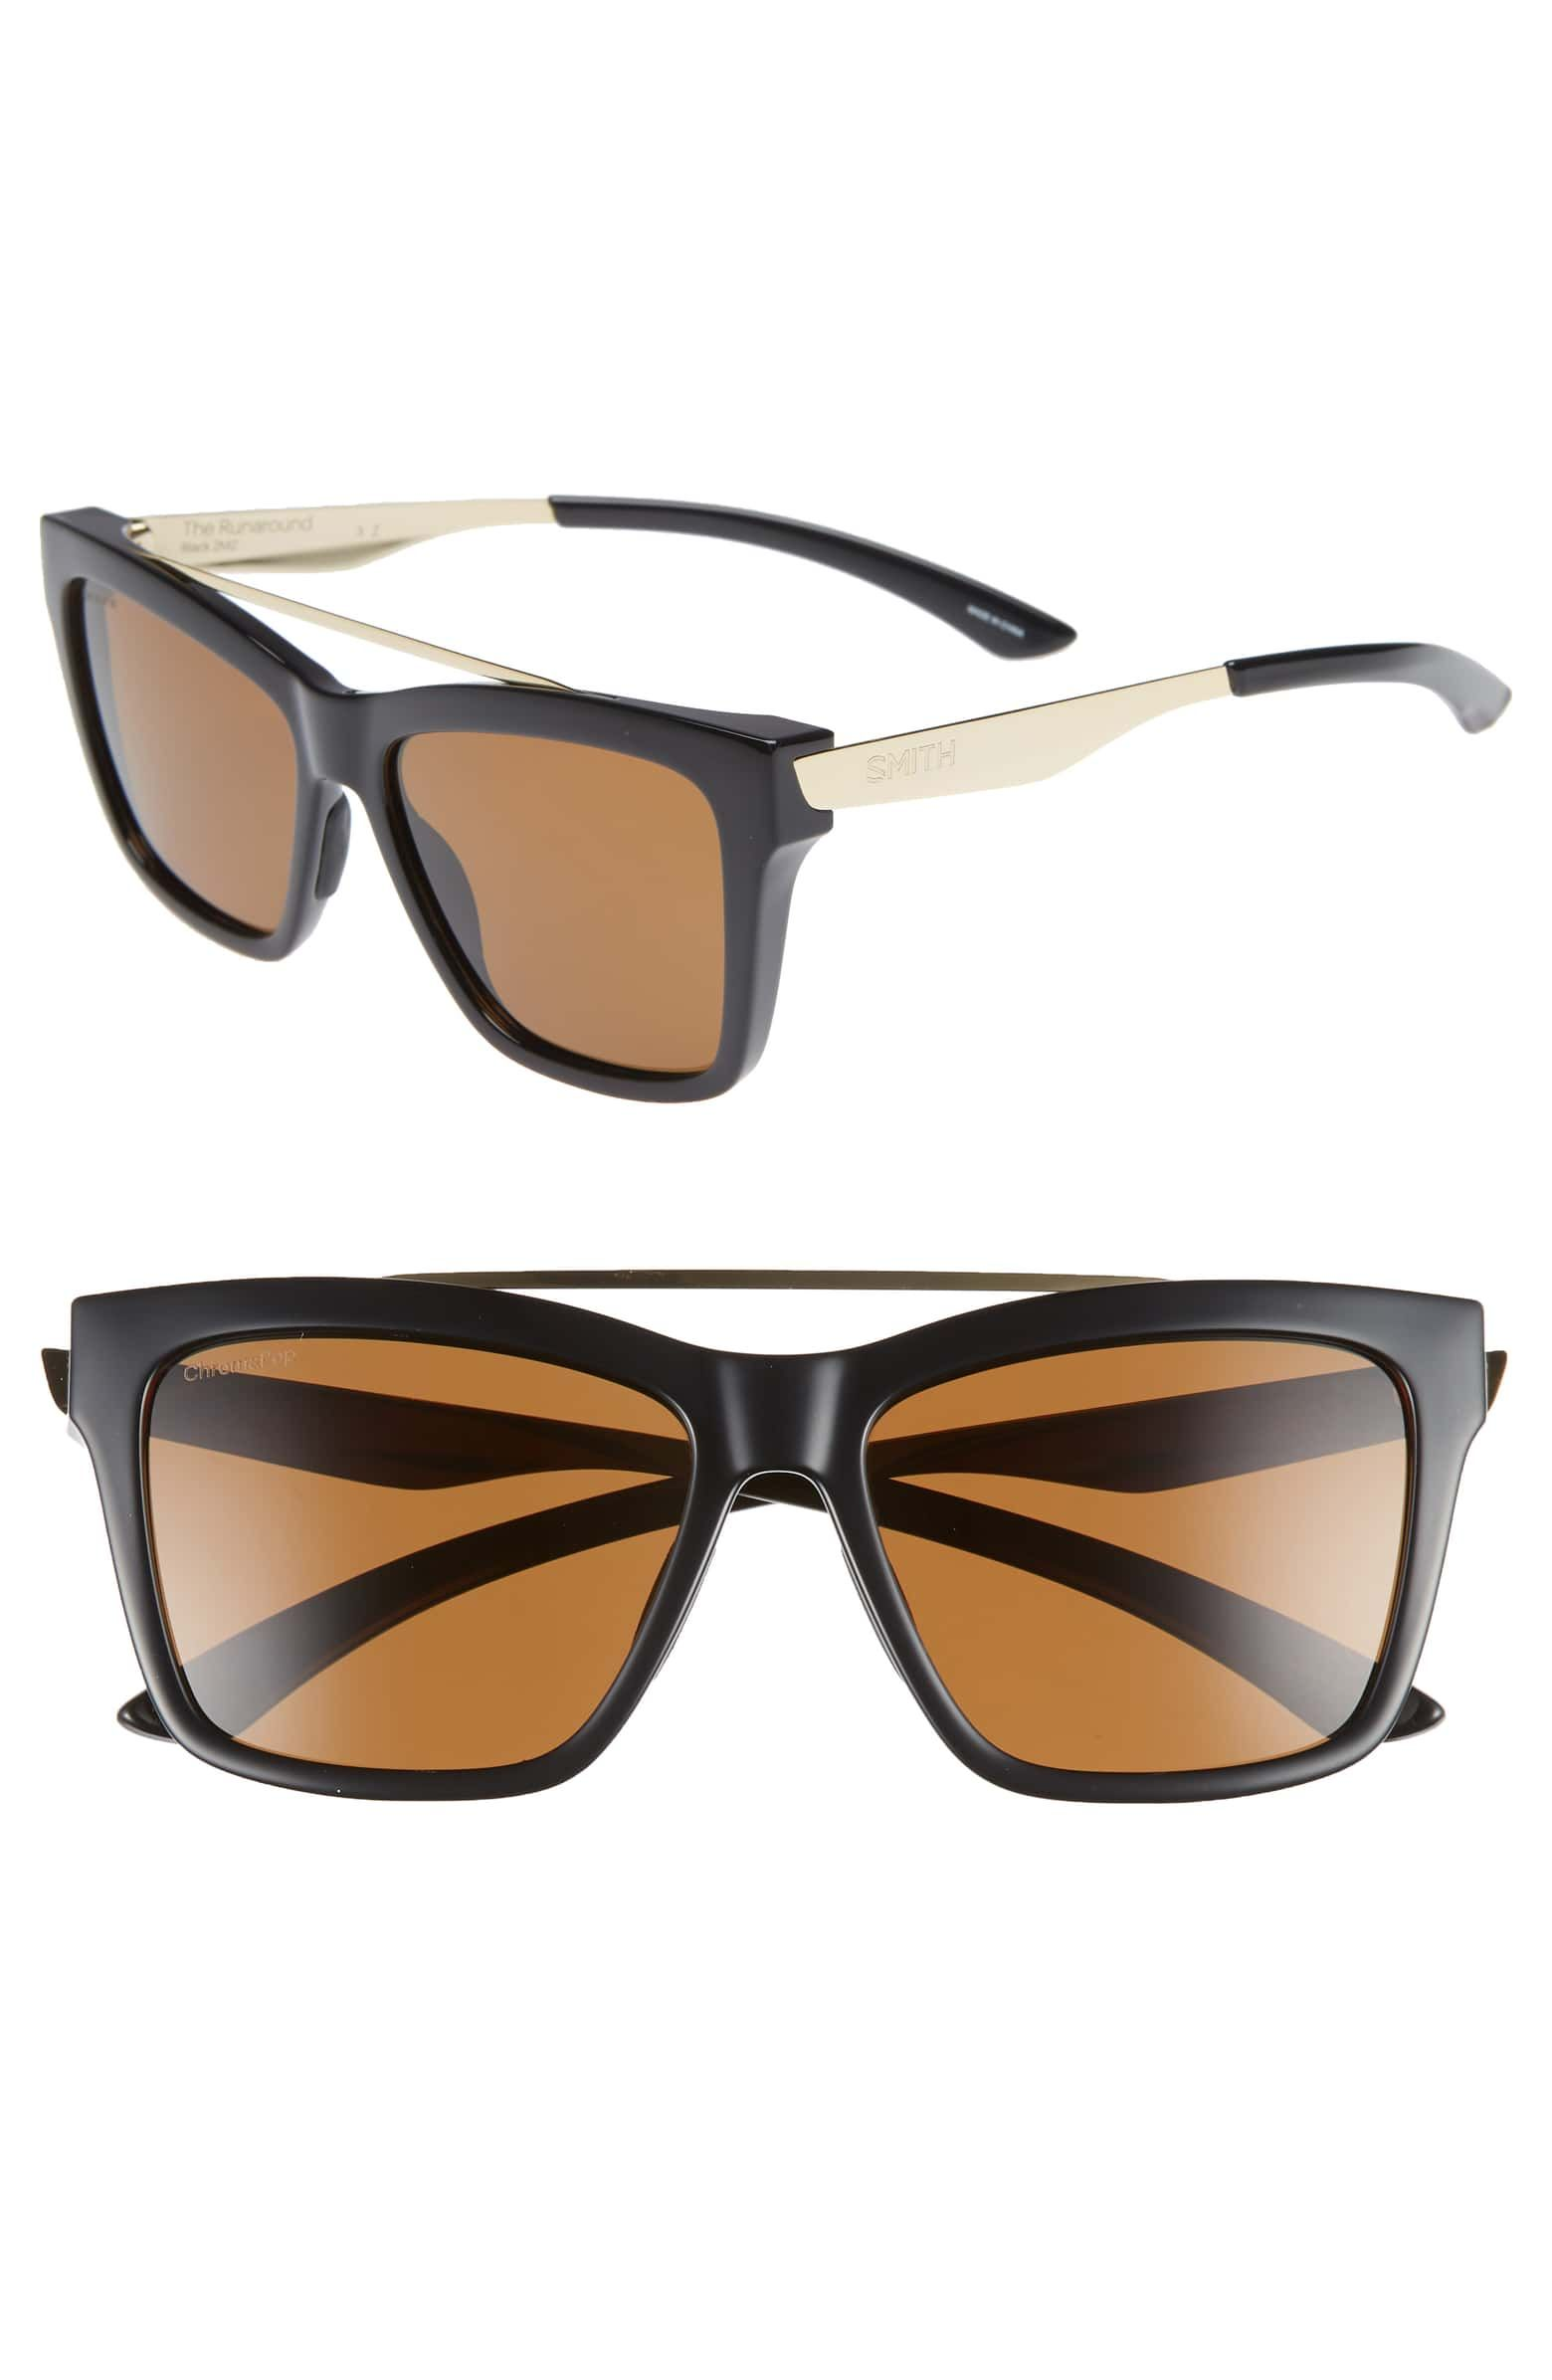 Smith Optics Colette 55mm Polarized Sunglasses